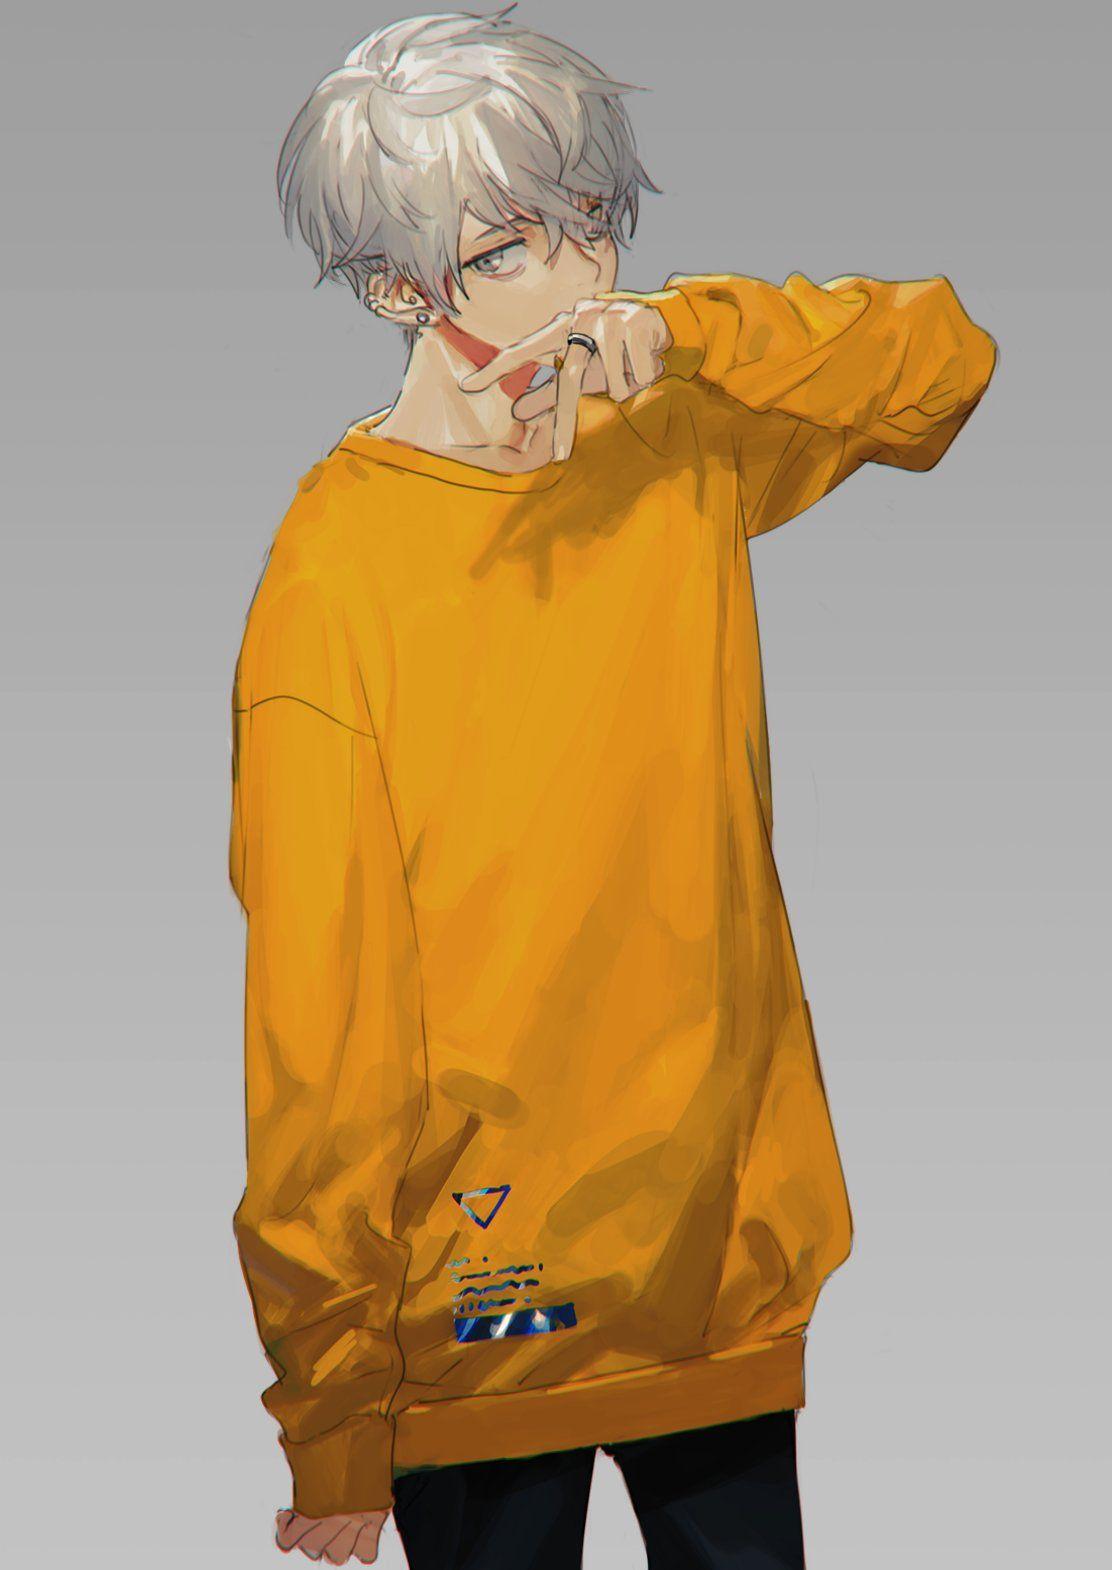 Anime Boy Cute Anime Boy Cute Anime Guys Anime